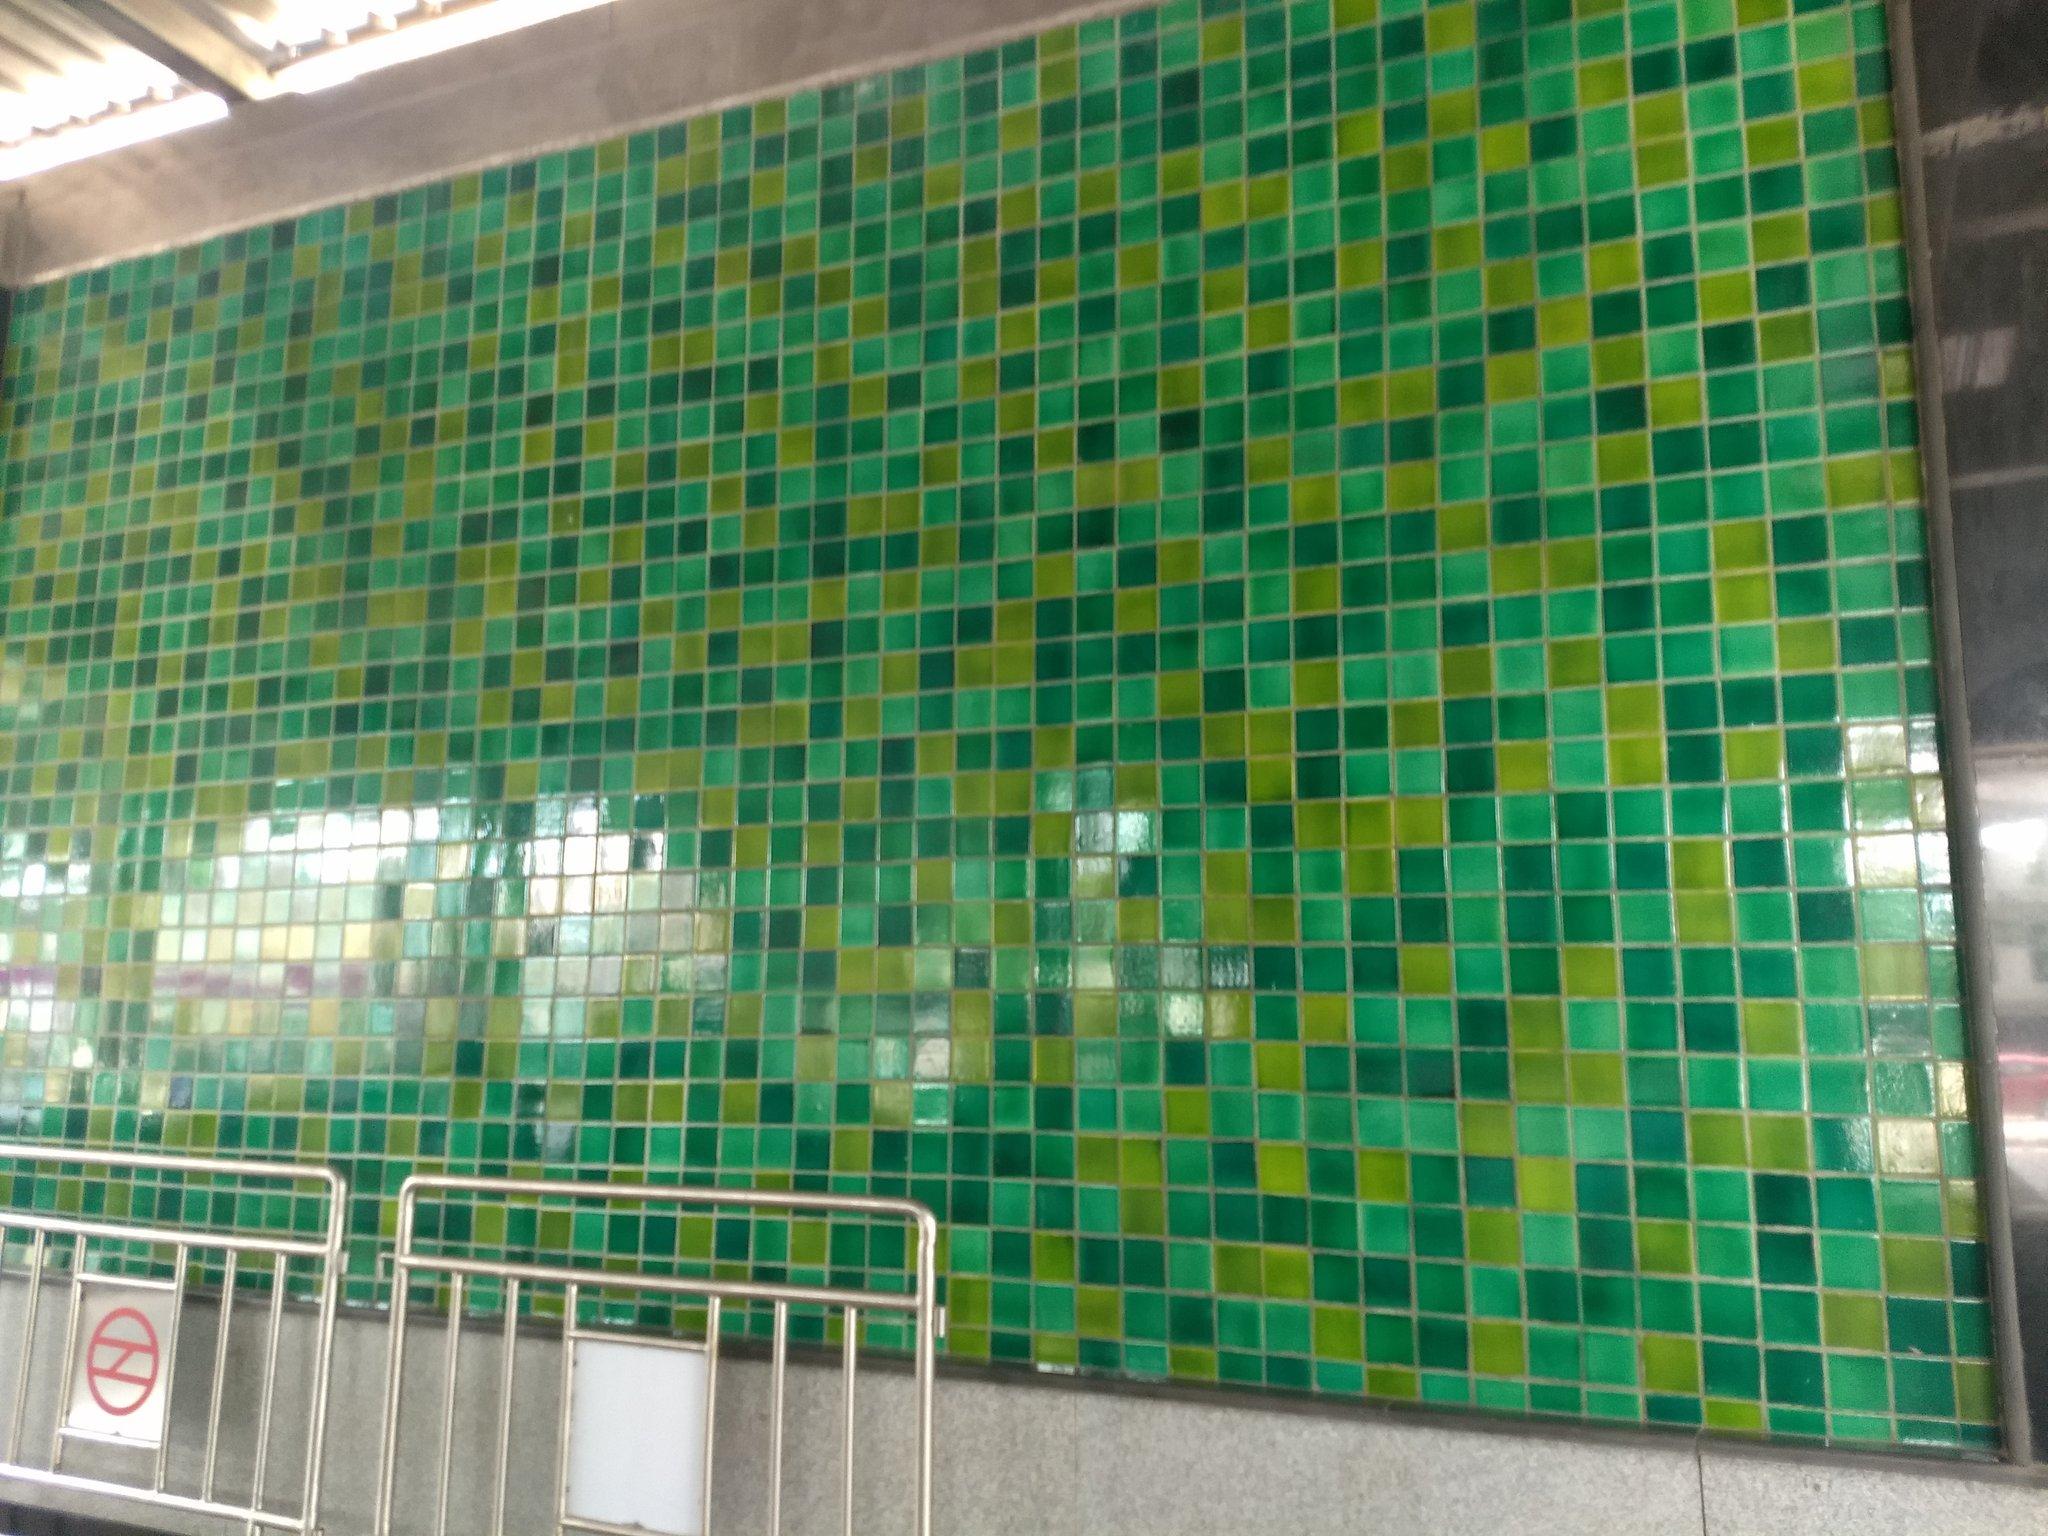 GitHub subway station